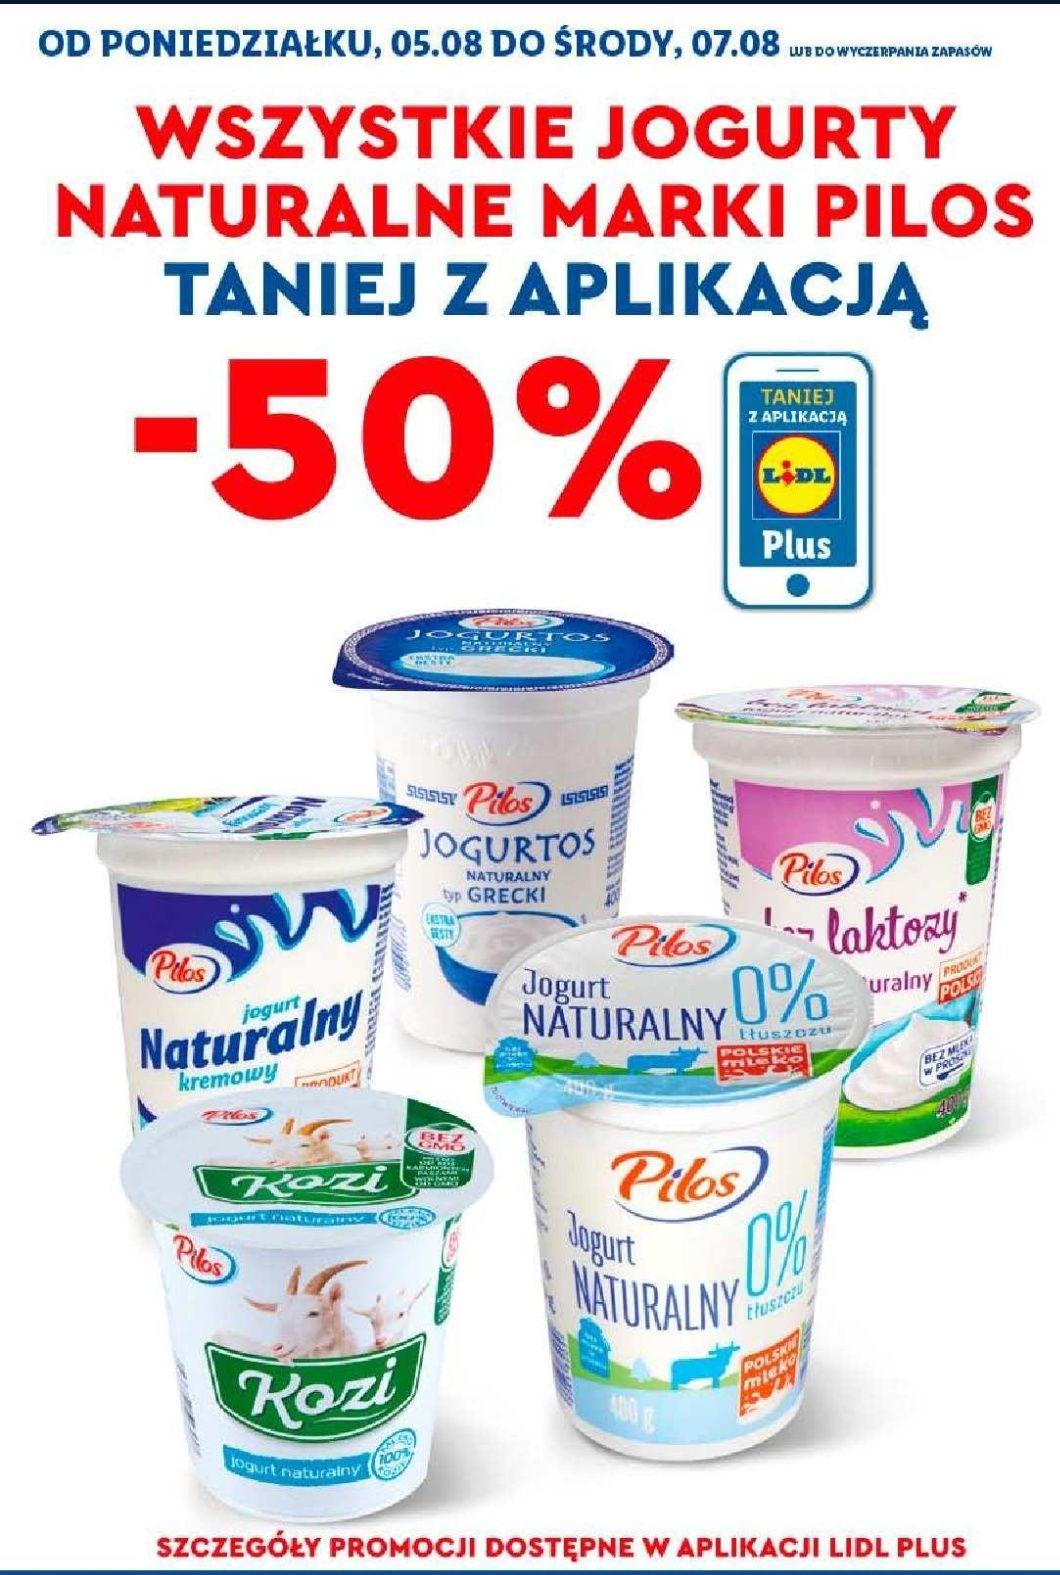 Jogurty naturalne Pilos -50% Aplikacja Lidl